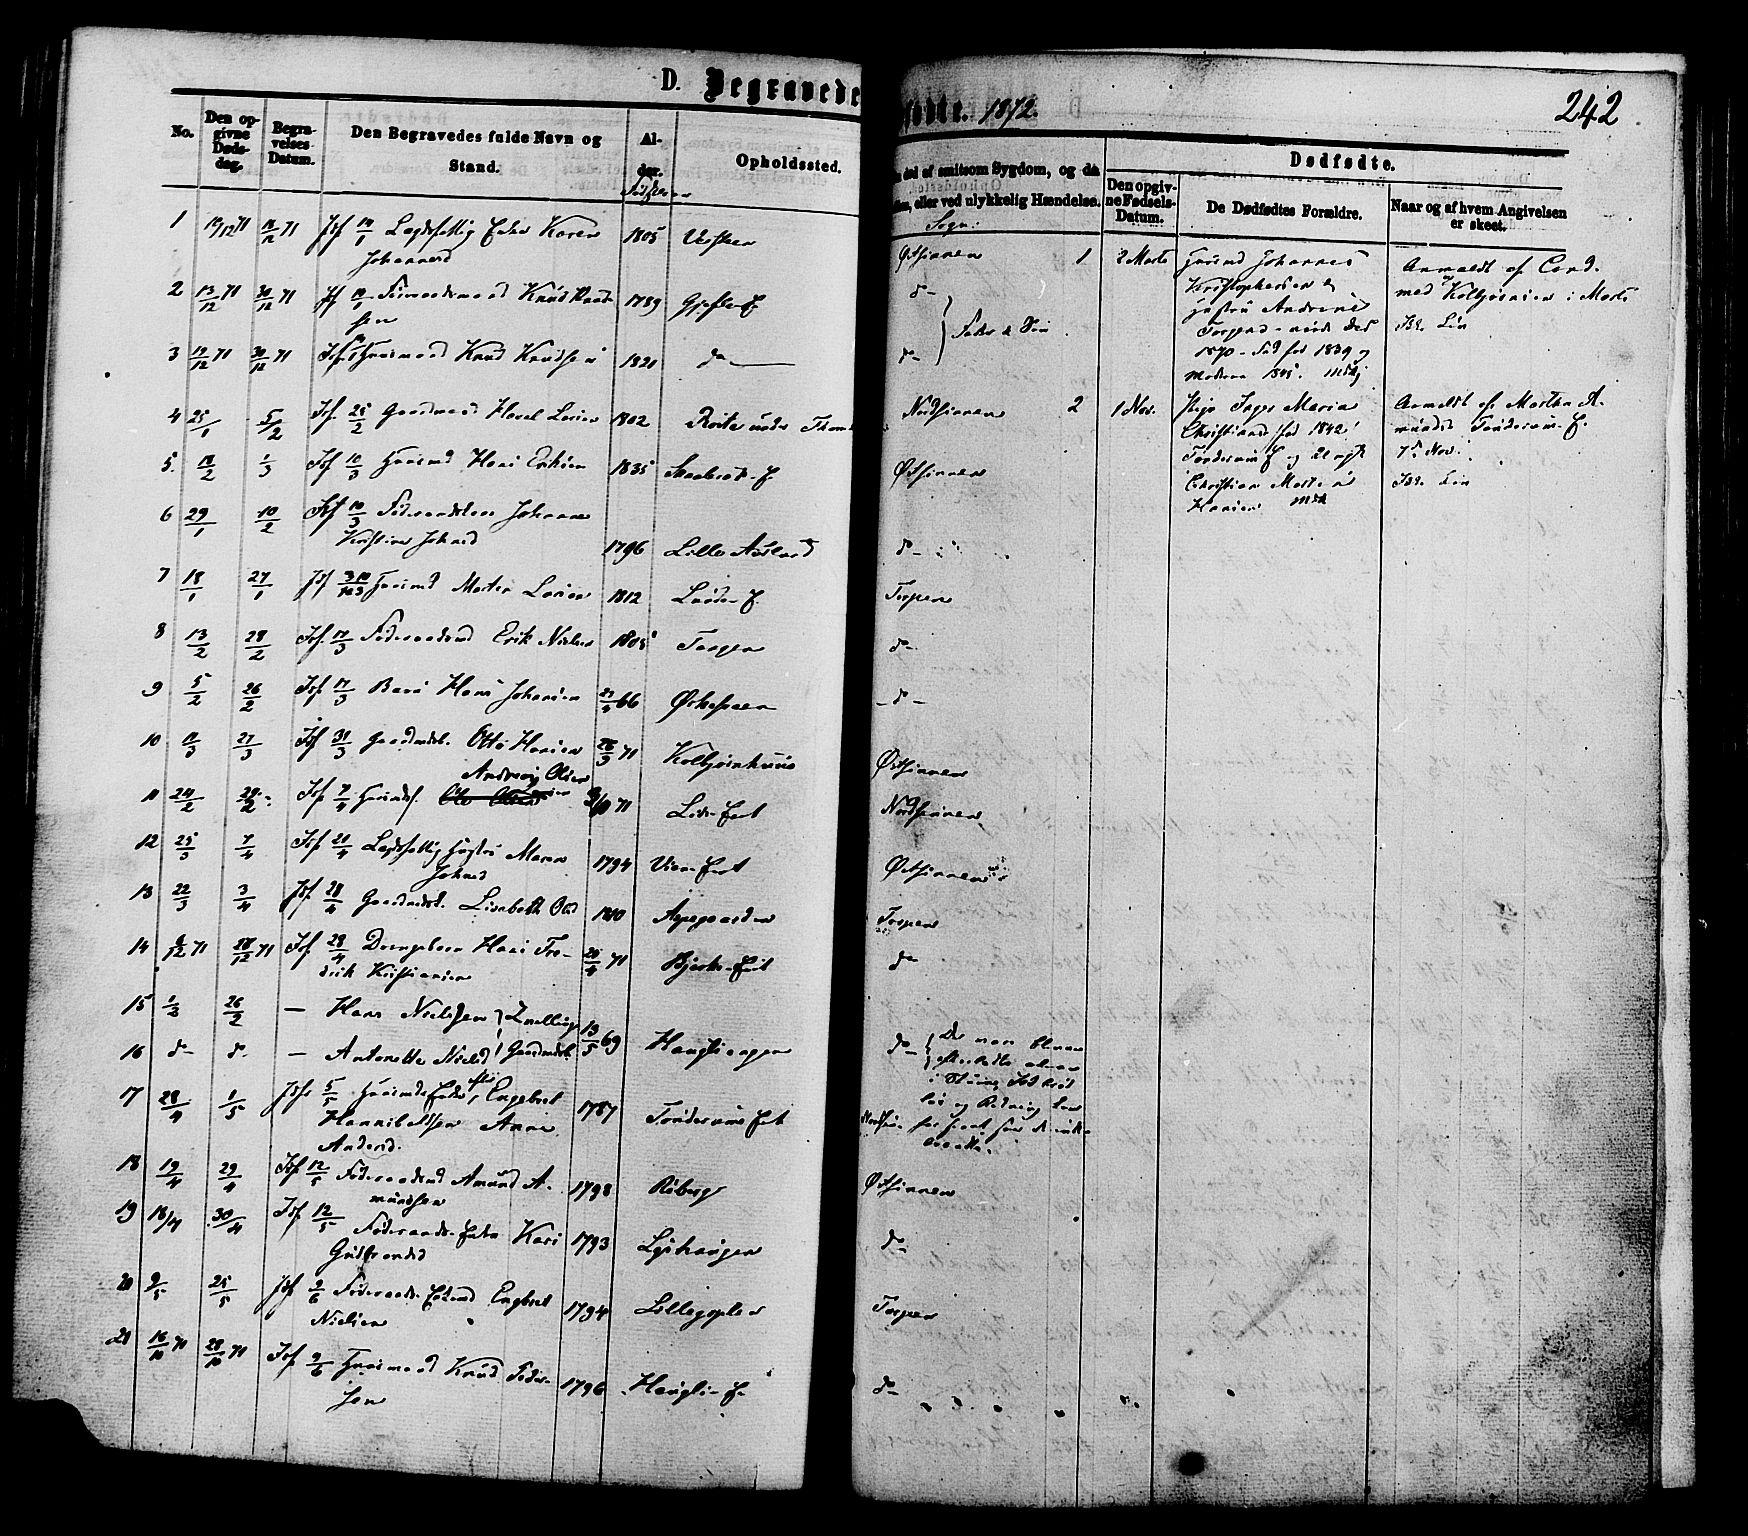 SAH, Nordre Land prestekontor, Ministerialbok nr. 2, 1872-1881, s. 242